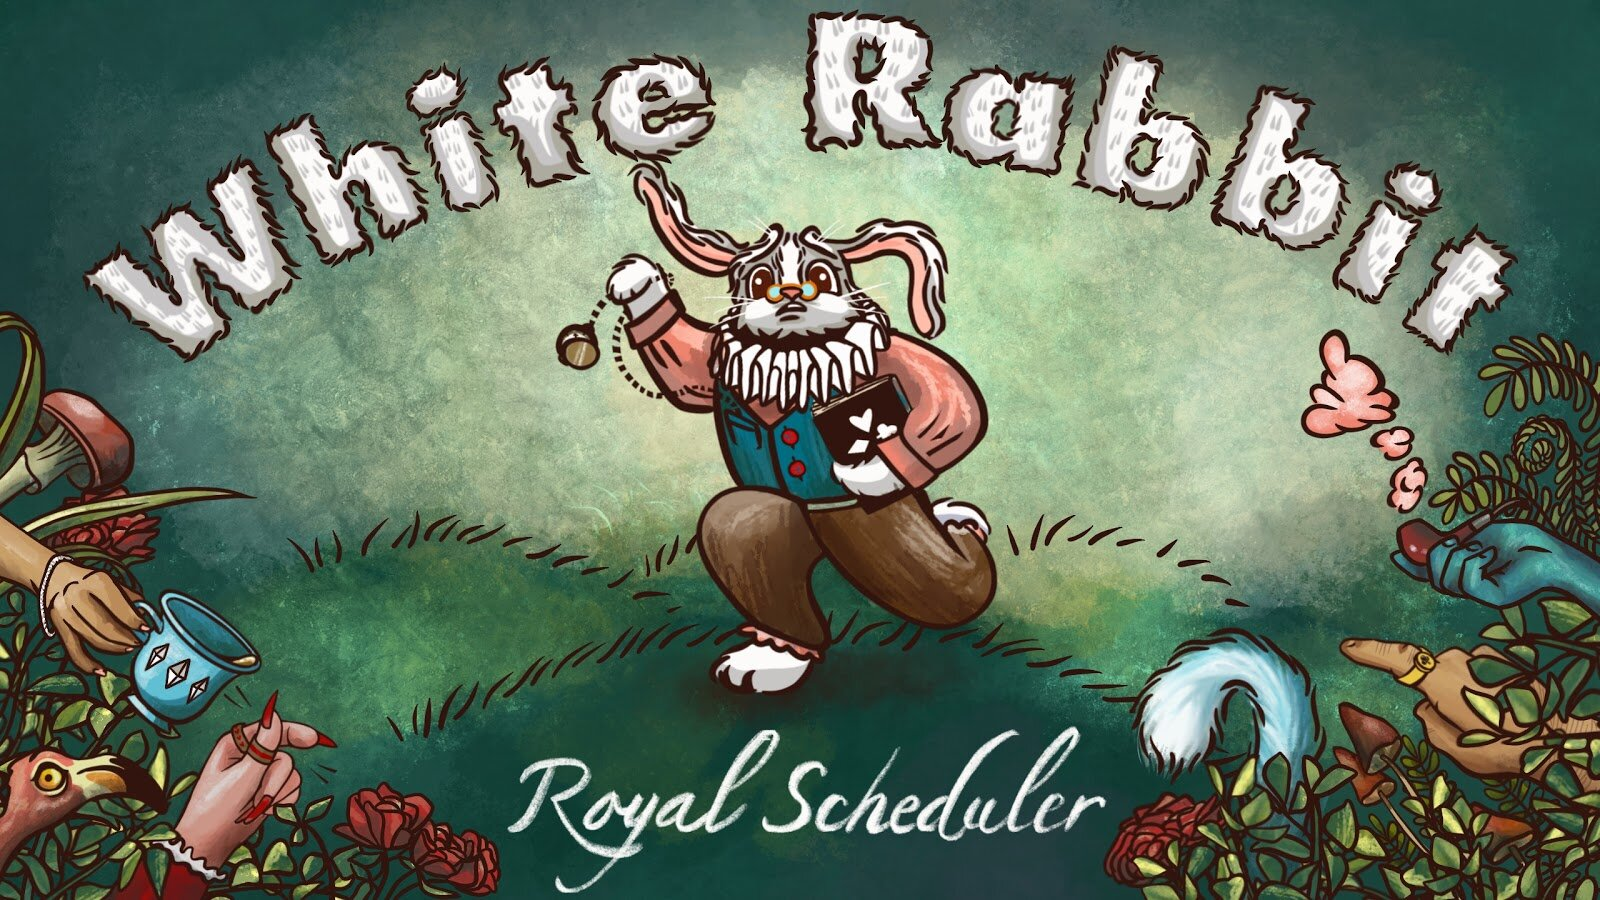 Rose's digital illustration of White Rabbit - Royal Scheduler by Skybear Games